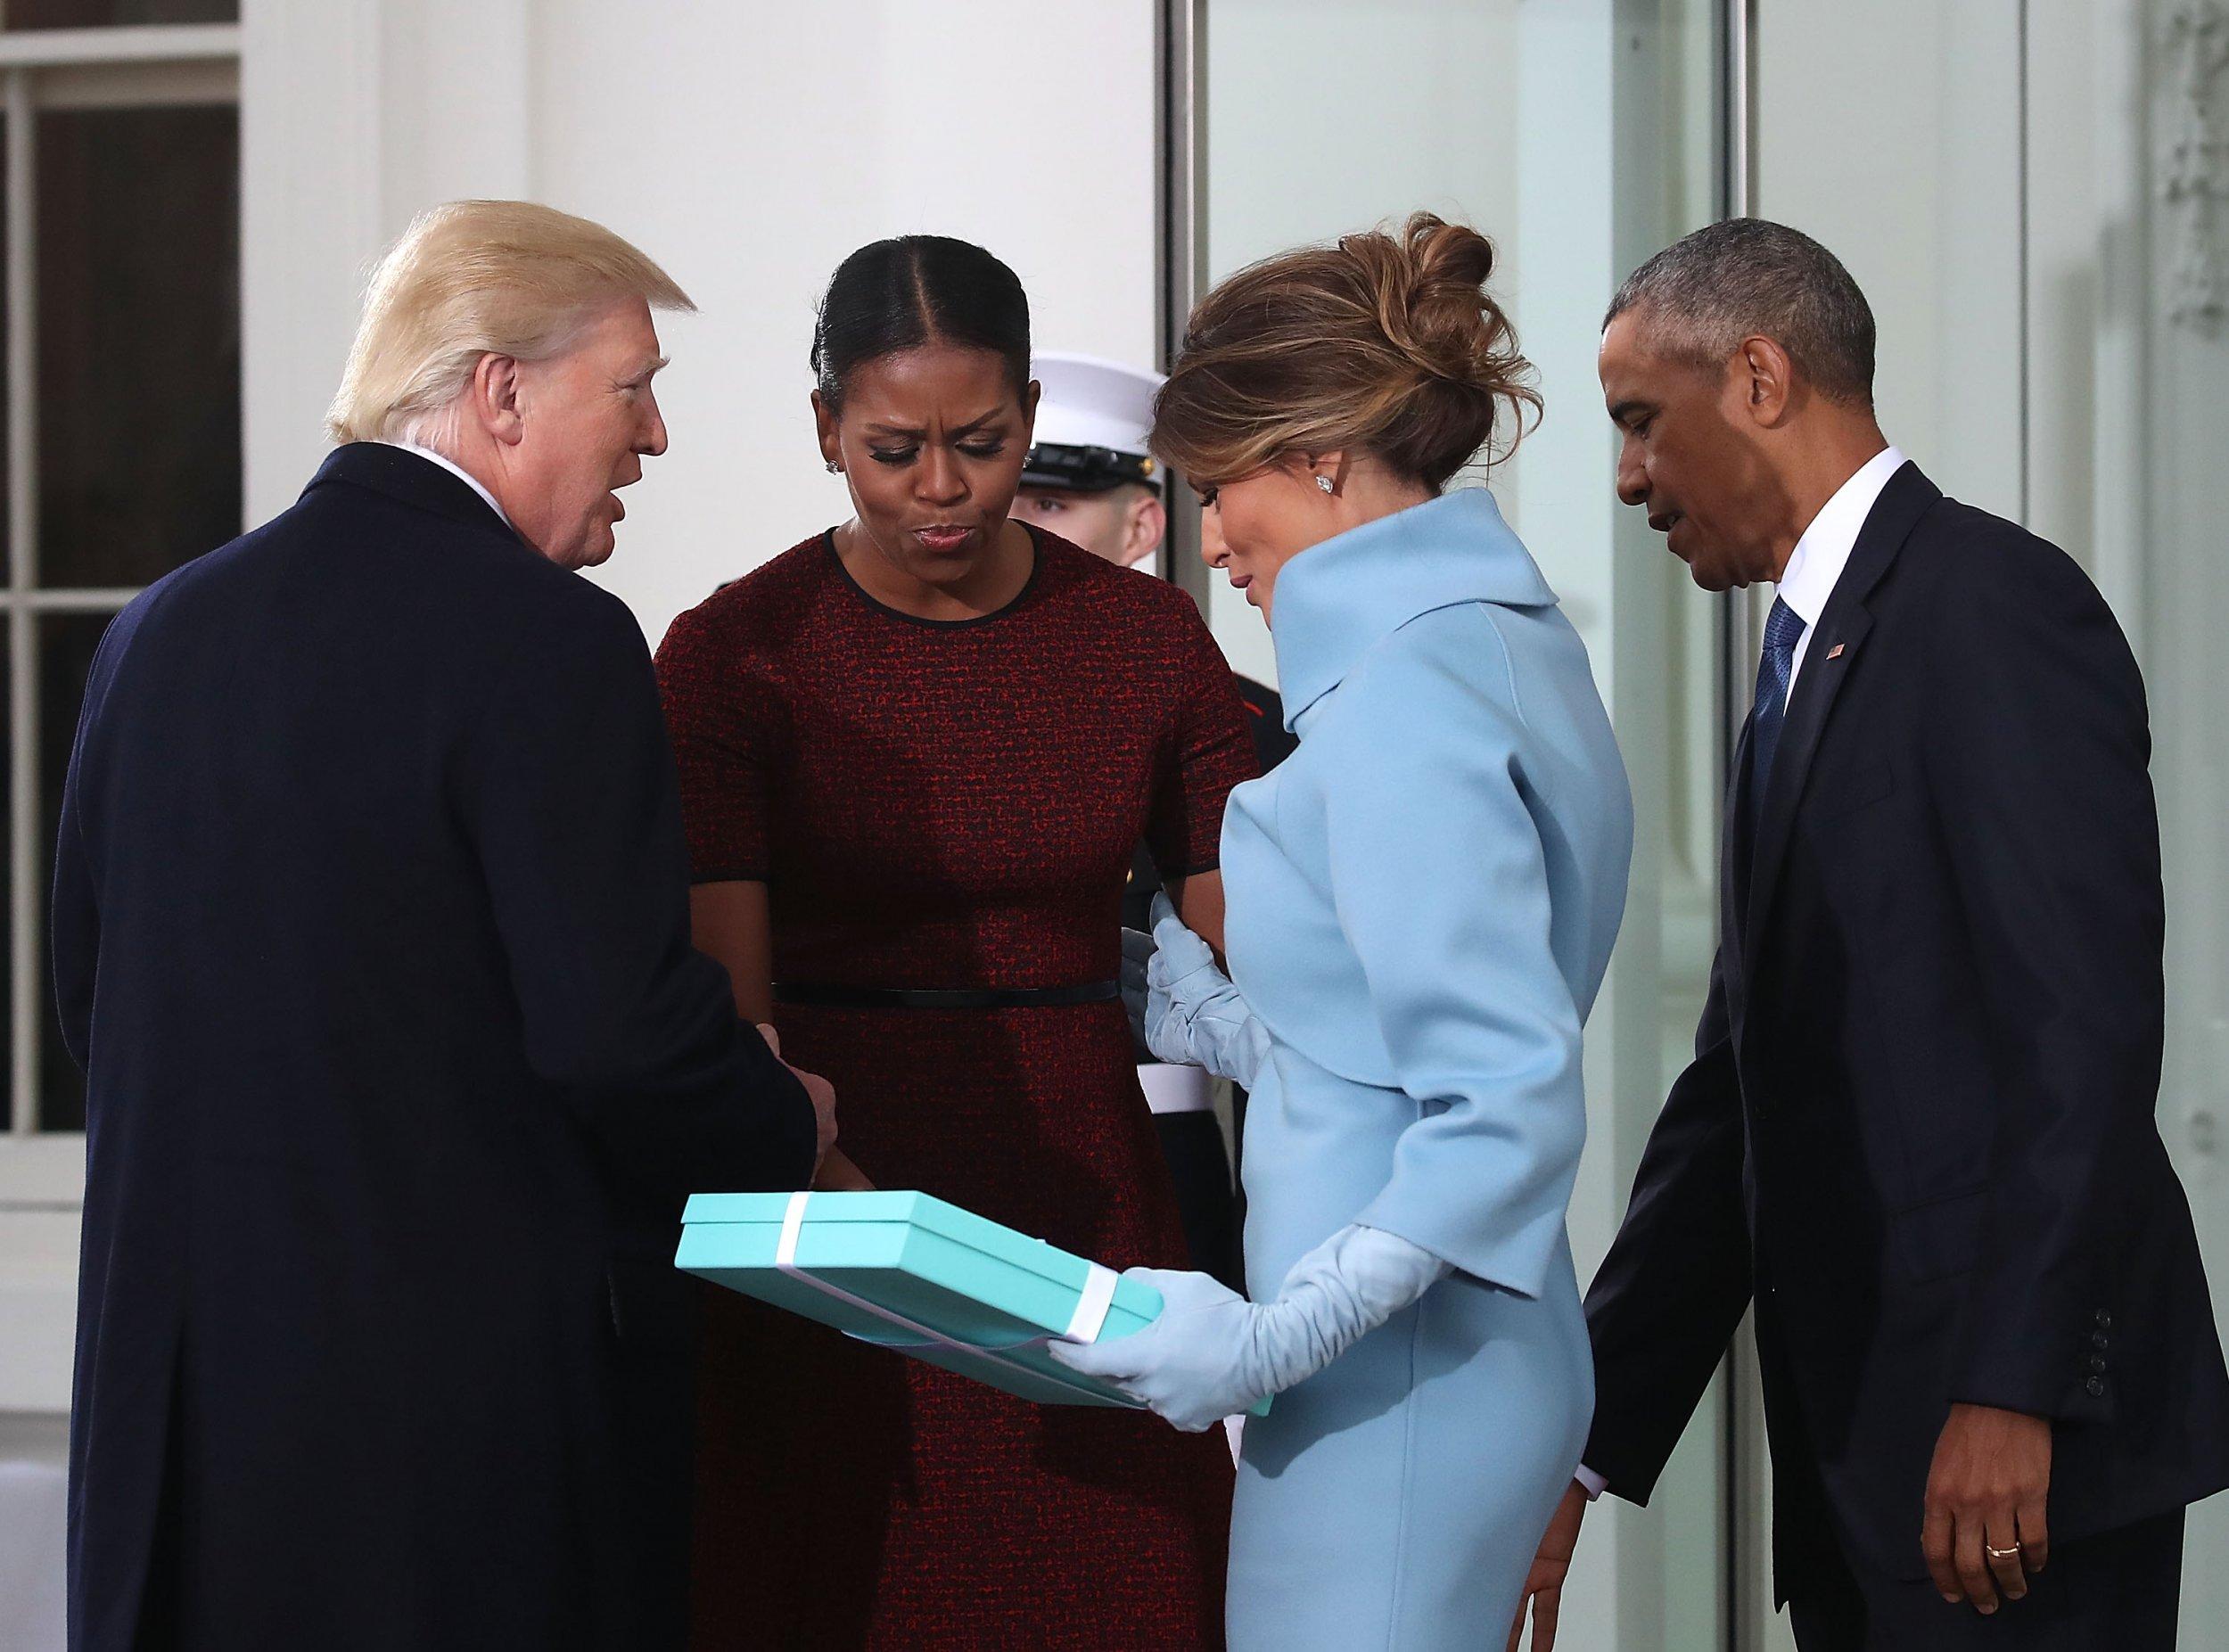 Melania Trump gives Michelle Obama a Tiffany box